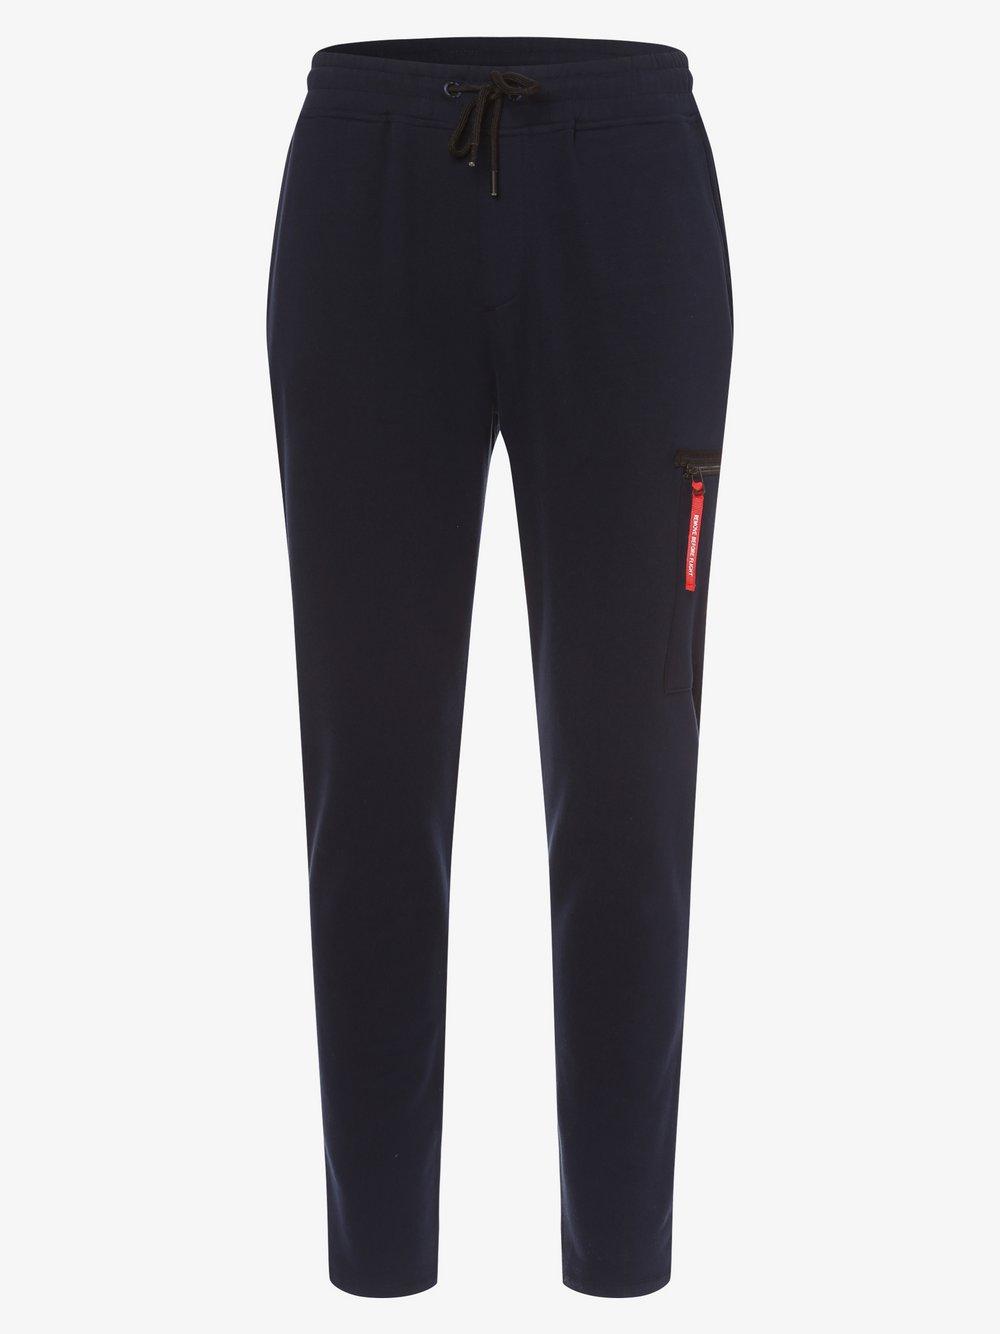 Aeronautica – Spodnie dresowe męskie, niebieski Van Graaf 477202-0001